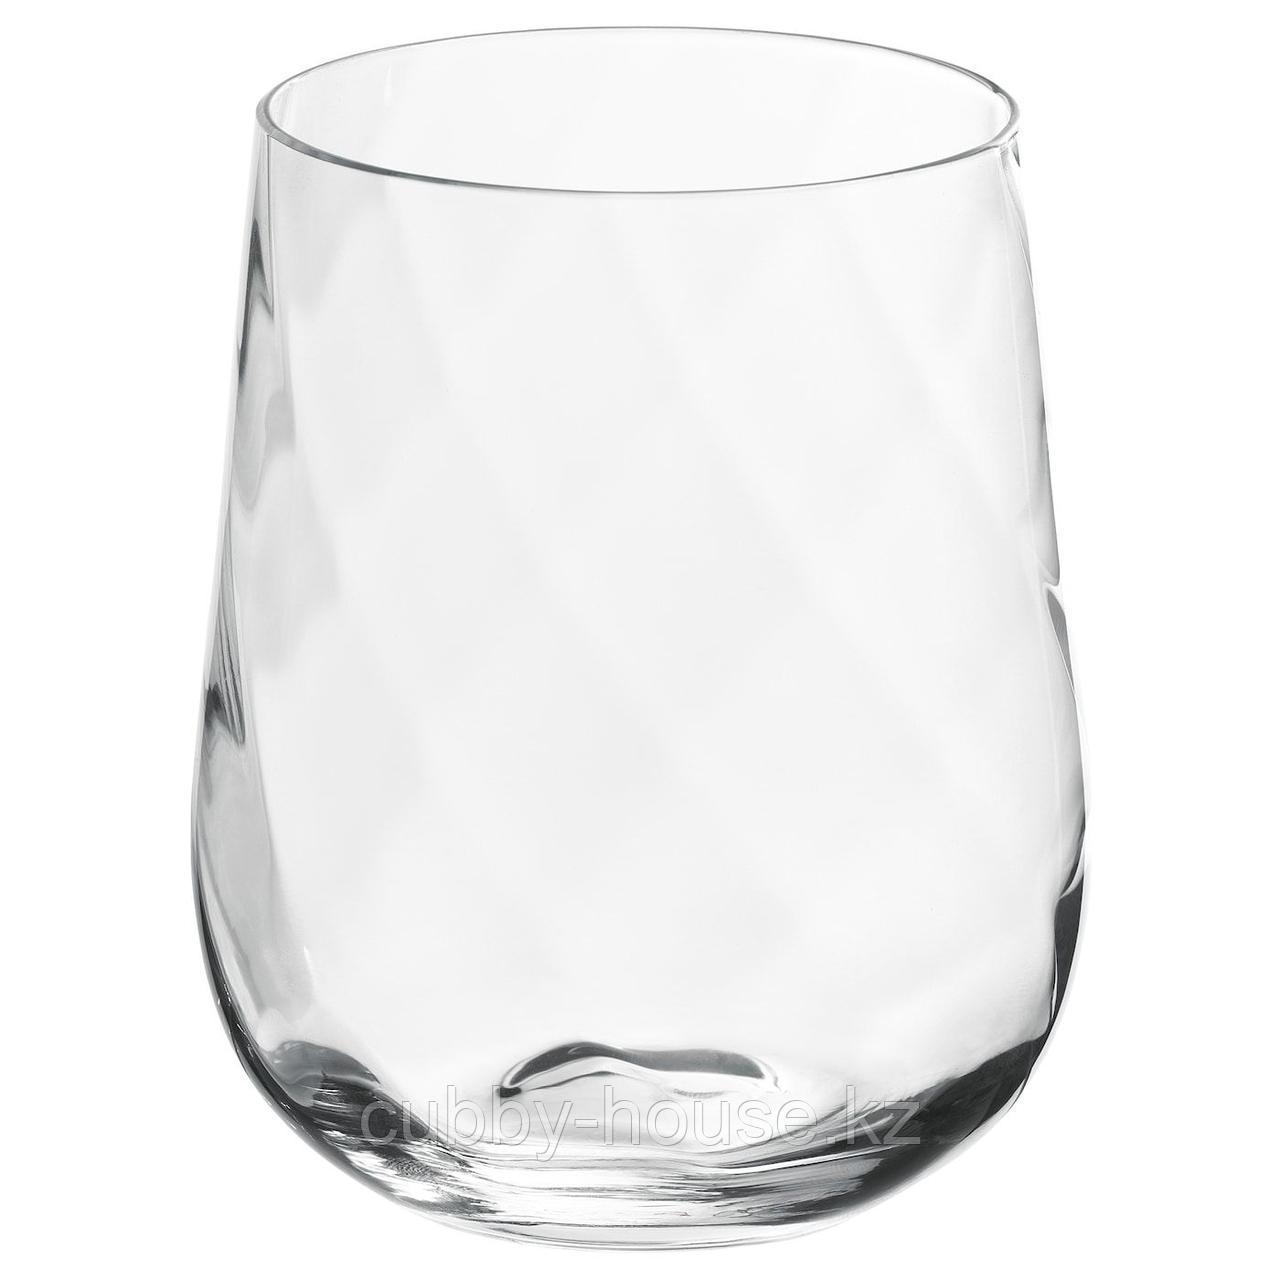 КОНУНГСЛИГ Стакан, прозрачное стекло, 35 сл